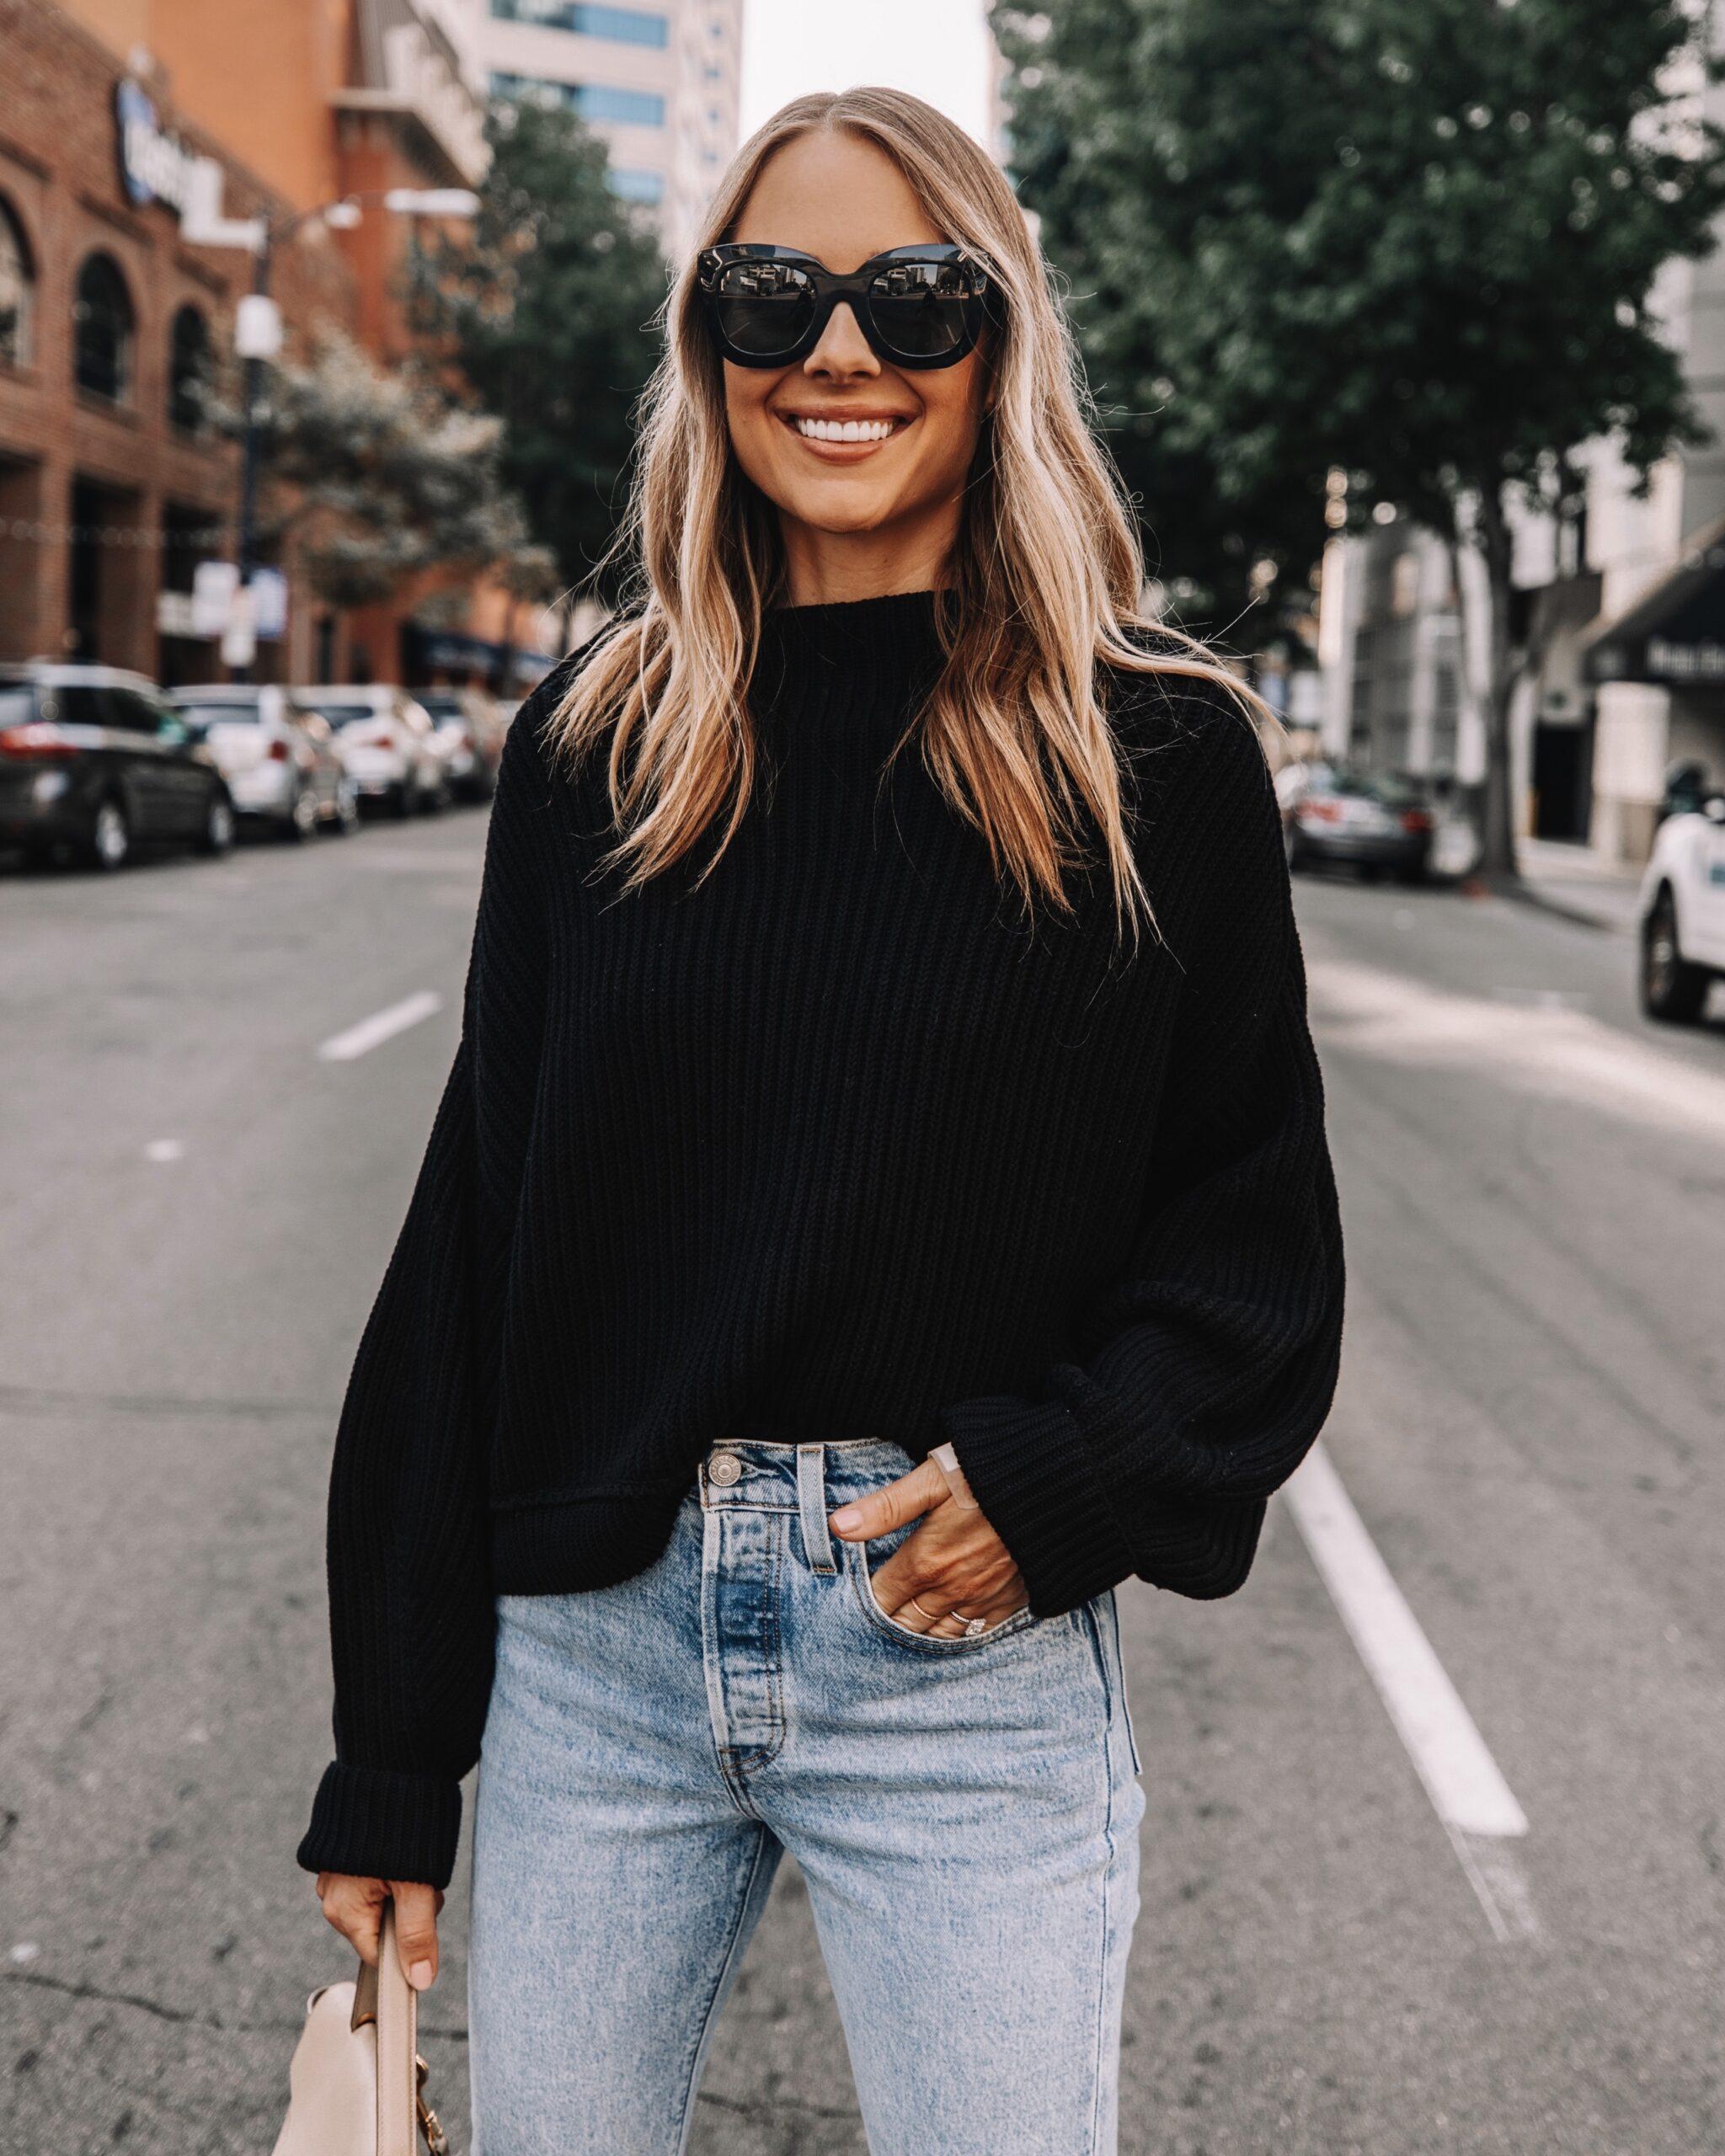 Fashion Jackson Wearing Celine Sunglasses Free People Black Sweater